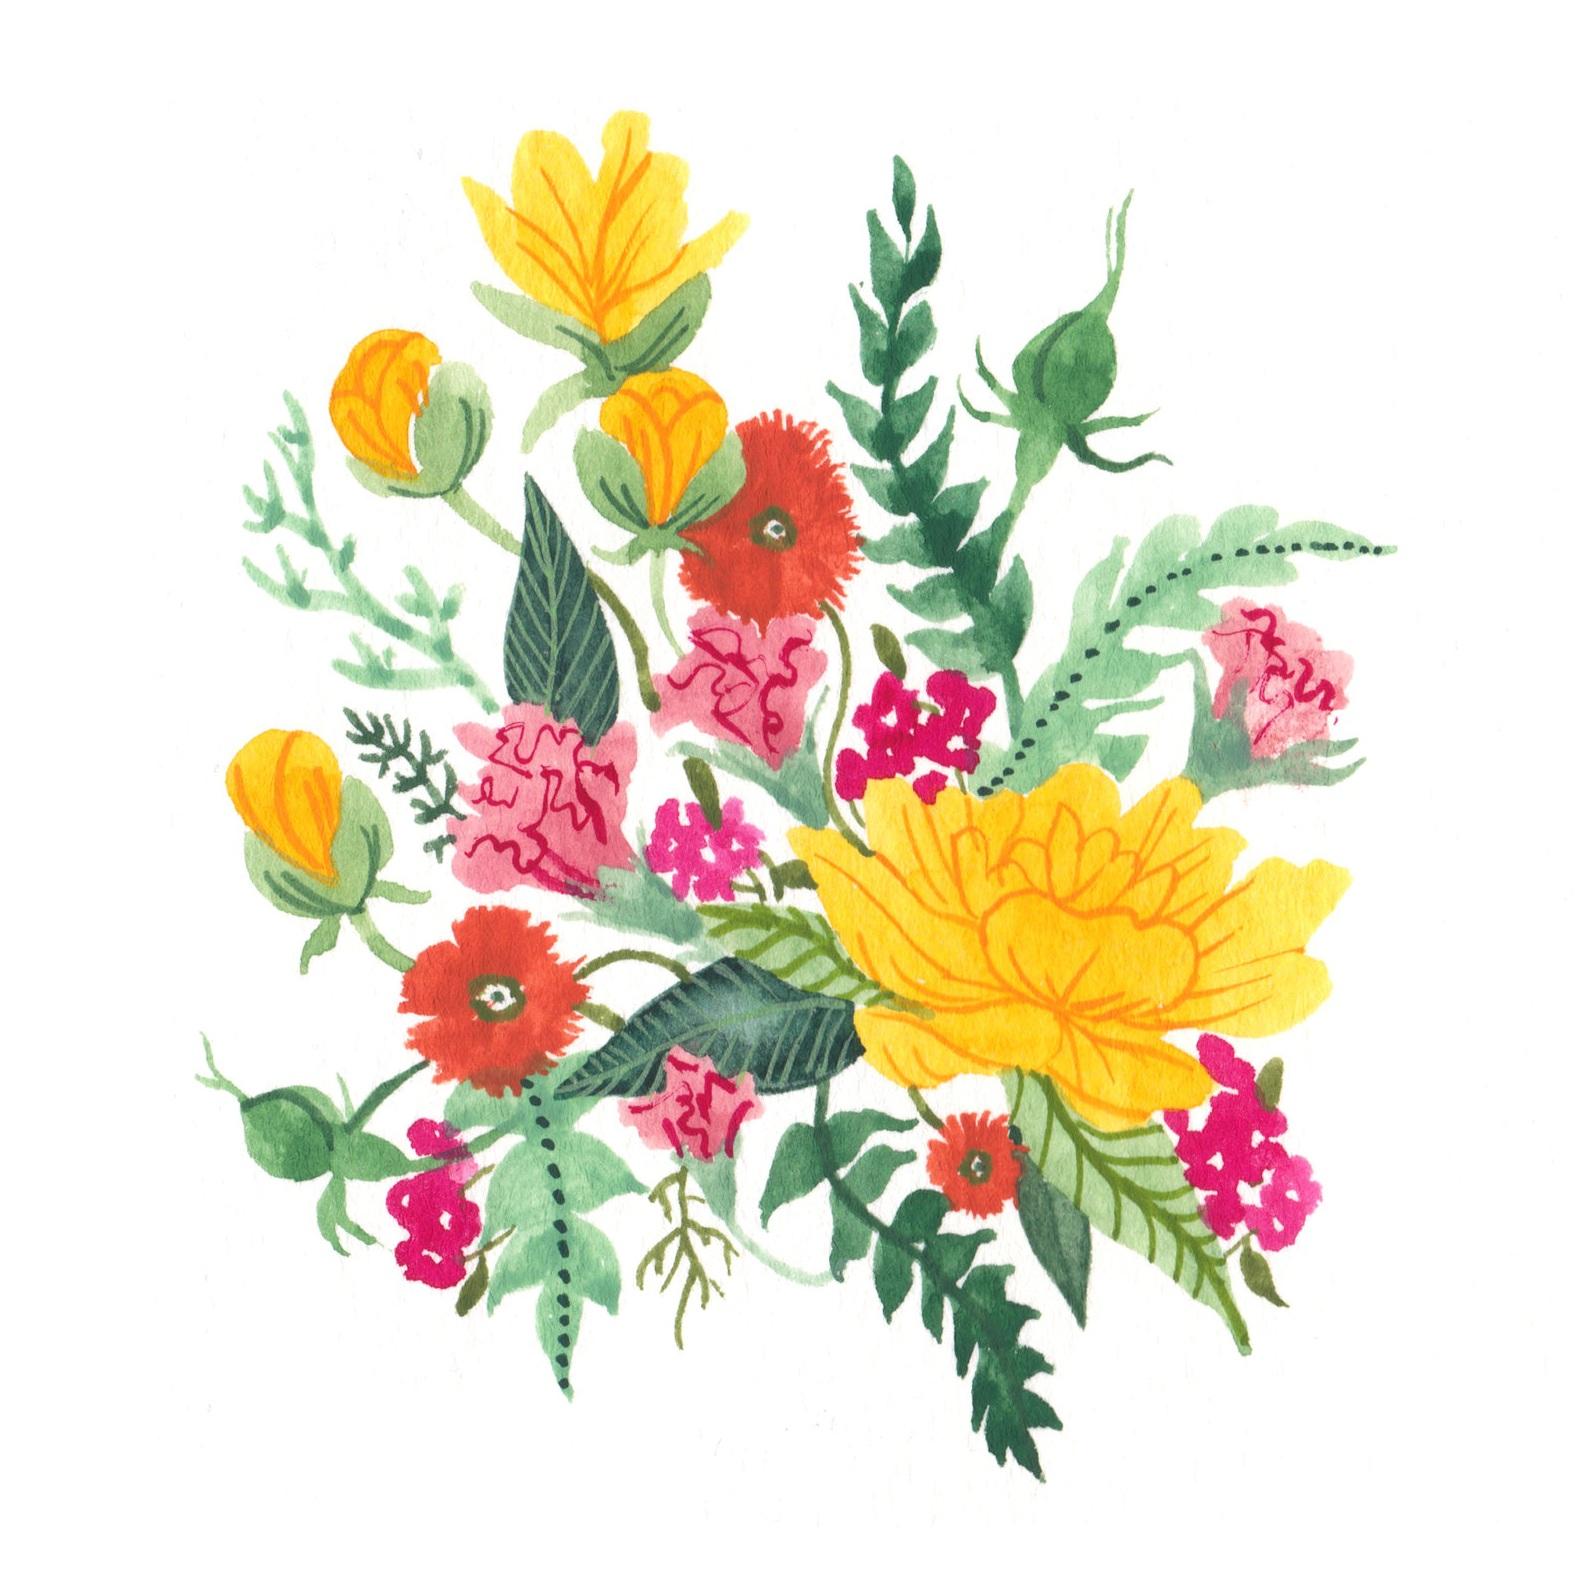 Peonies & Carnations,  2019